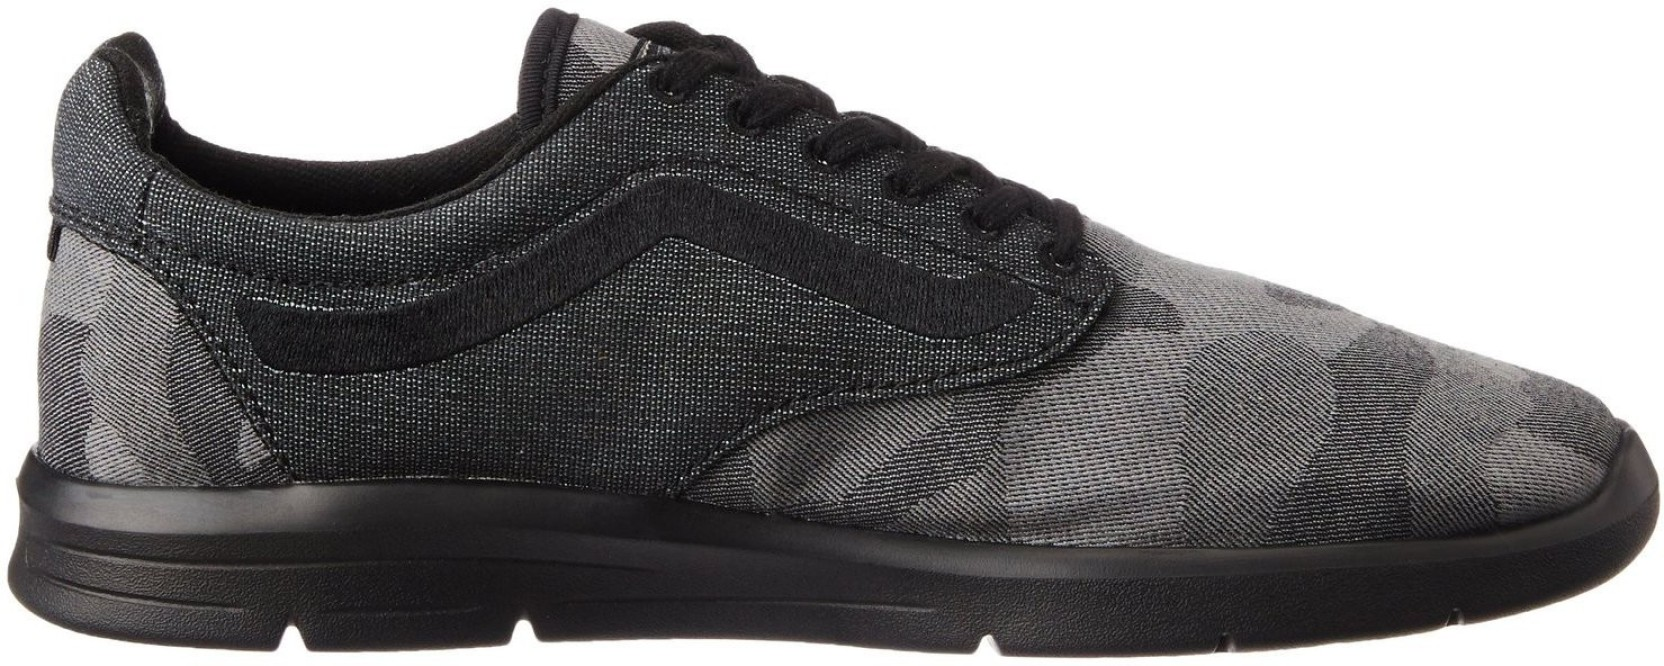 a61f7744ee50d5 Vans Iso 1.5 Sneaker For Men - Buy Black Color Vans Iso 1.5 Sneaker ...